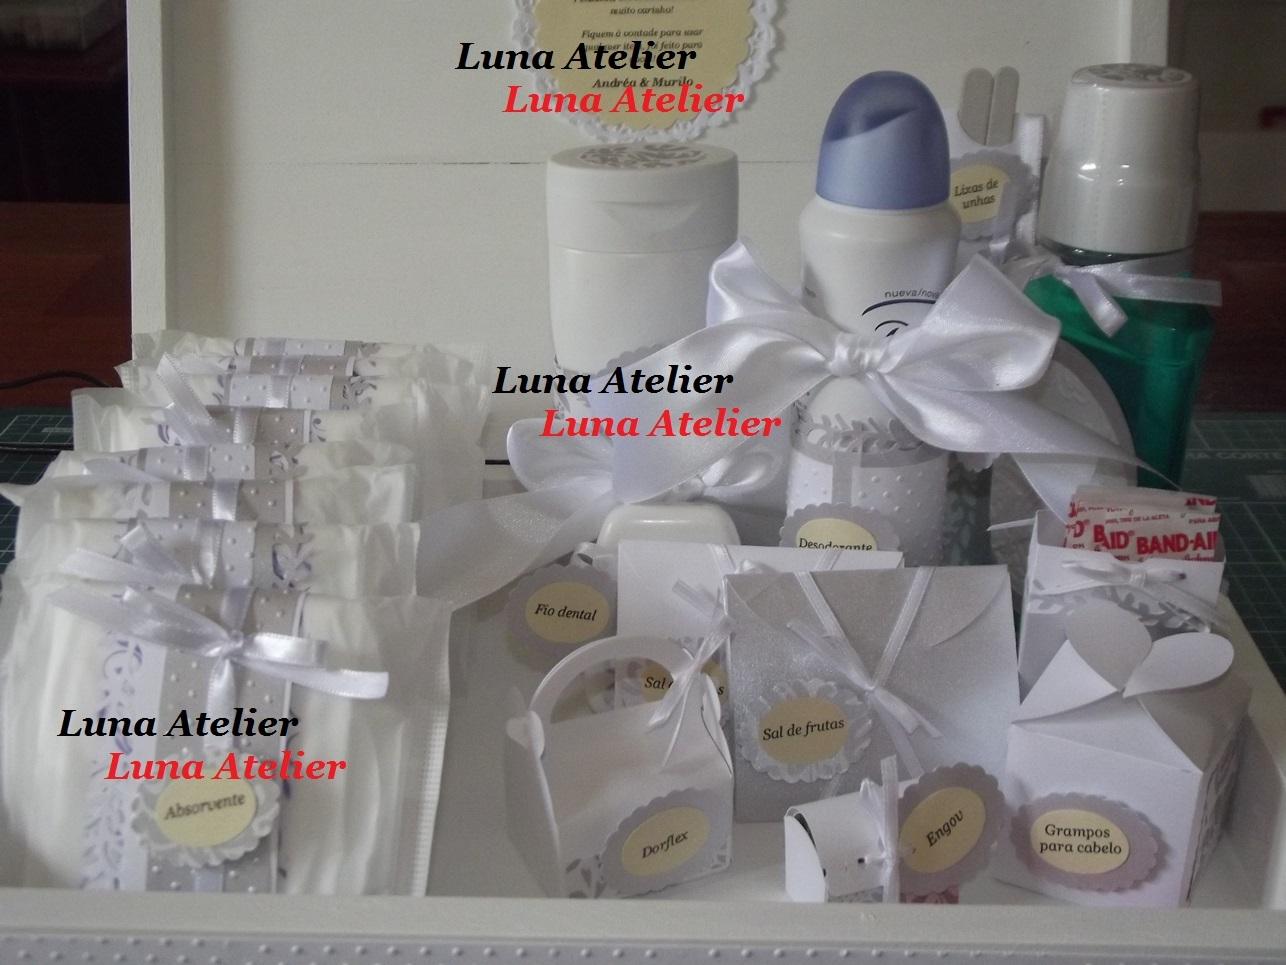 Kit Toalete Feminino Médio Casamento Luna Atelier Elo7 #7B5550 1286 965